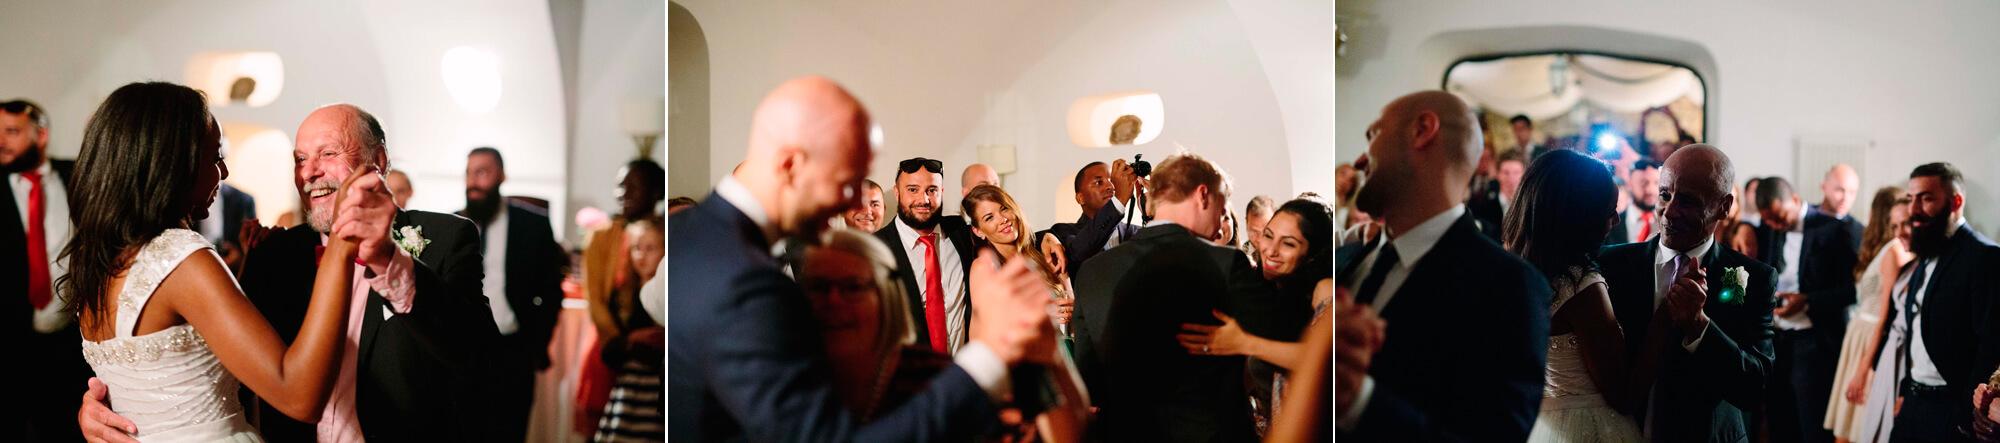 159-sorrento-wedding-photographer.jpg